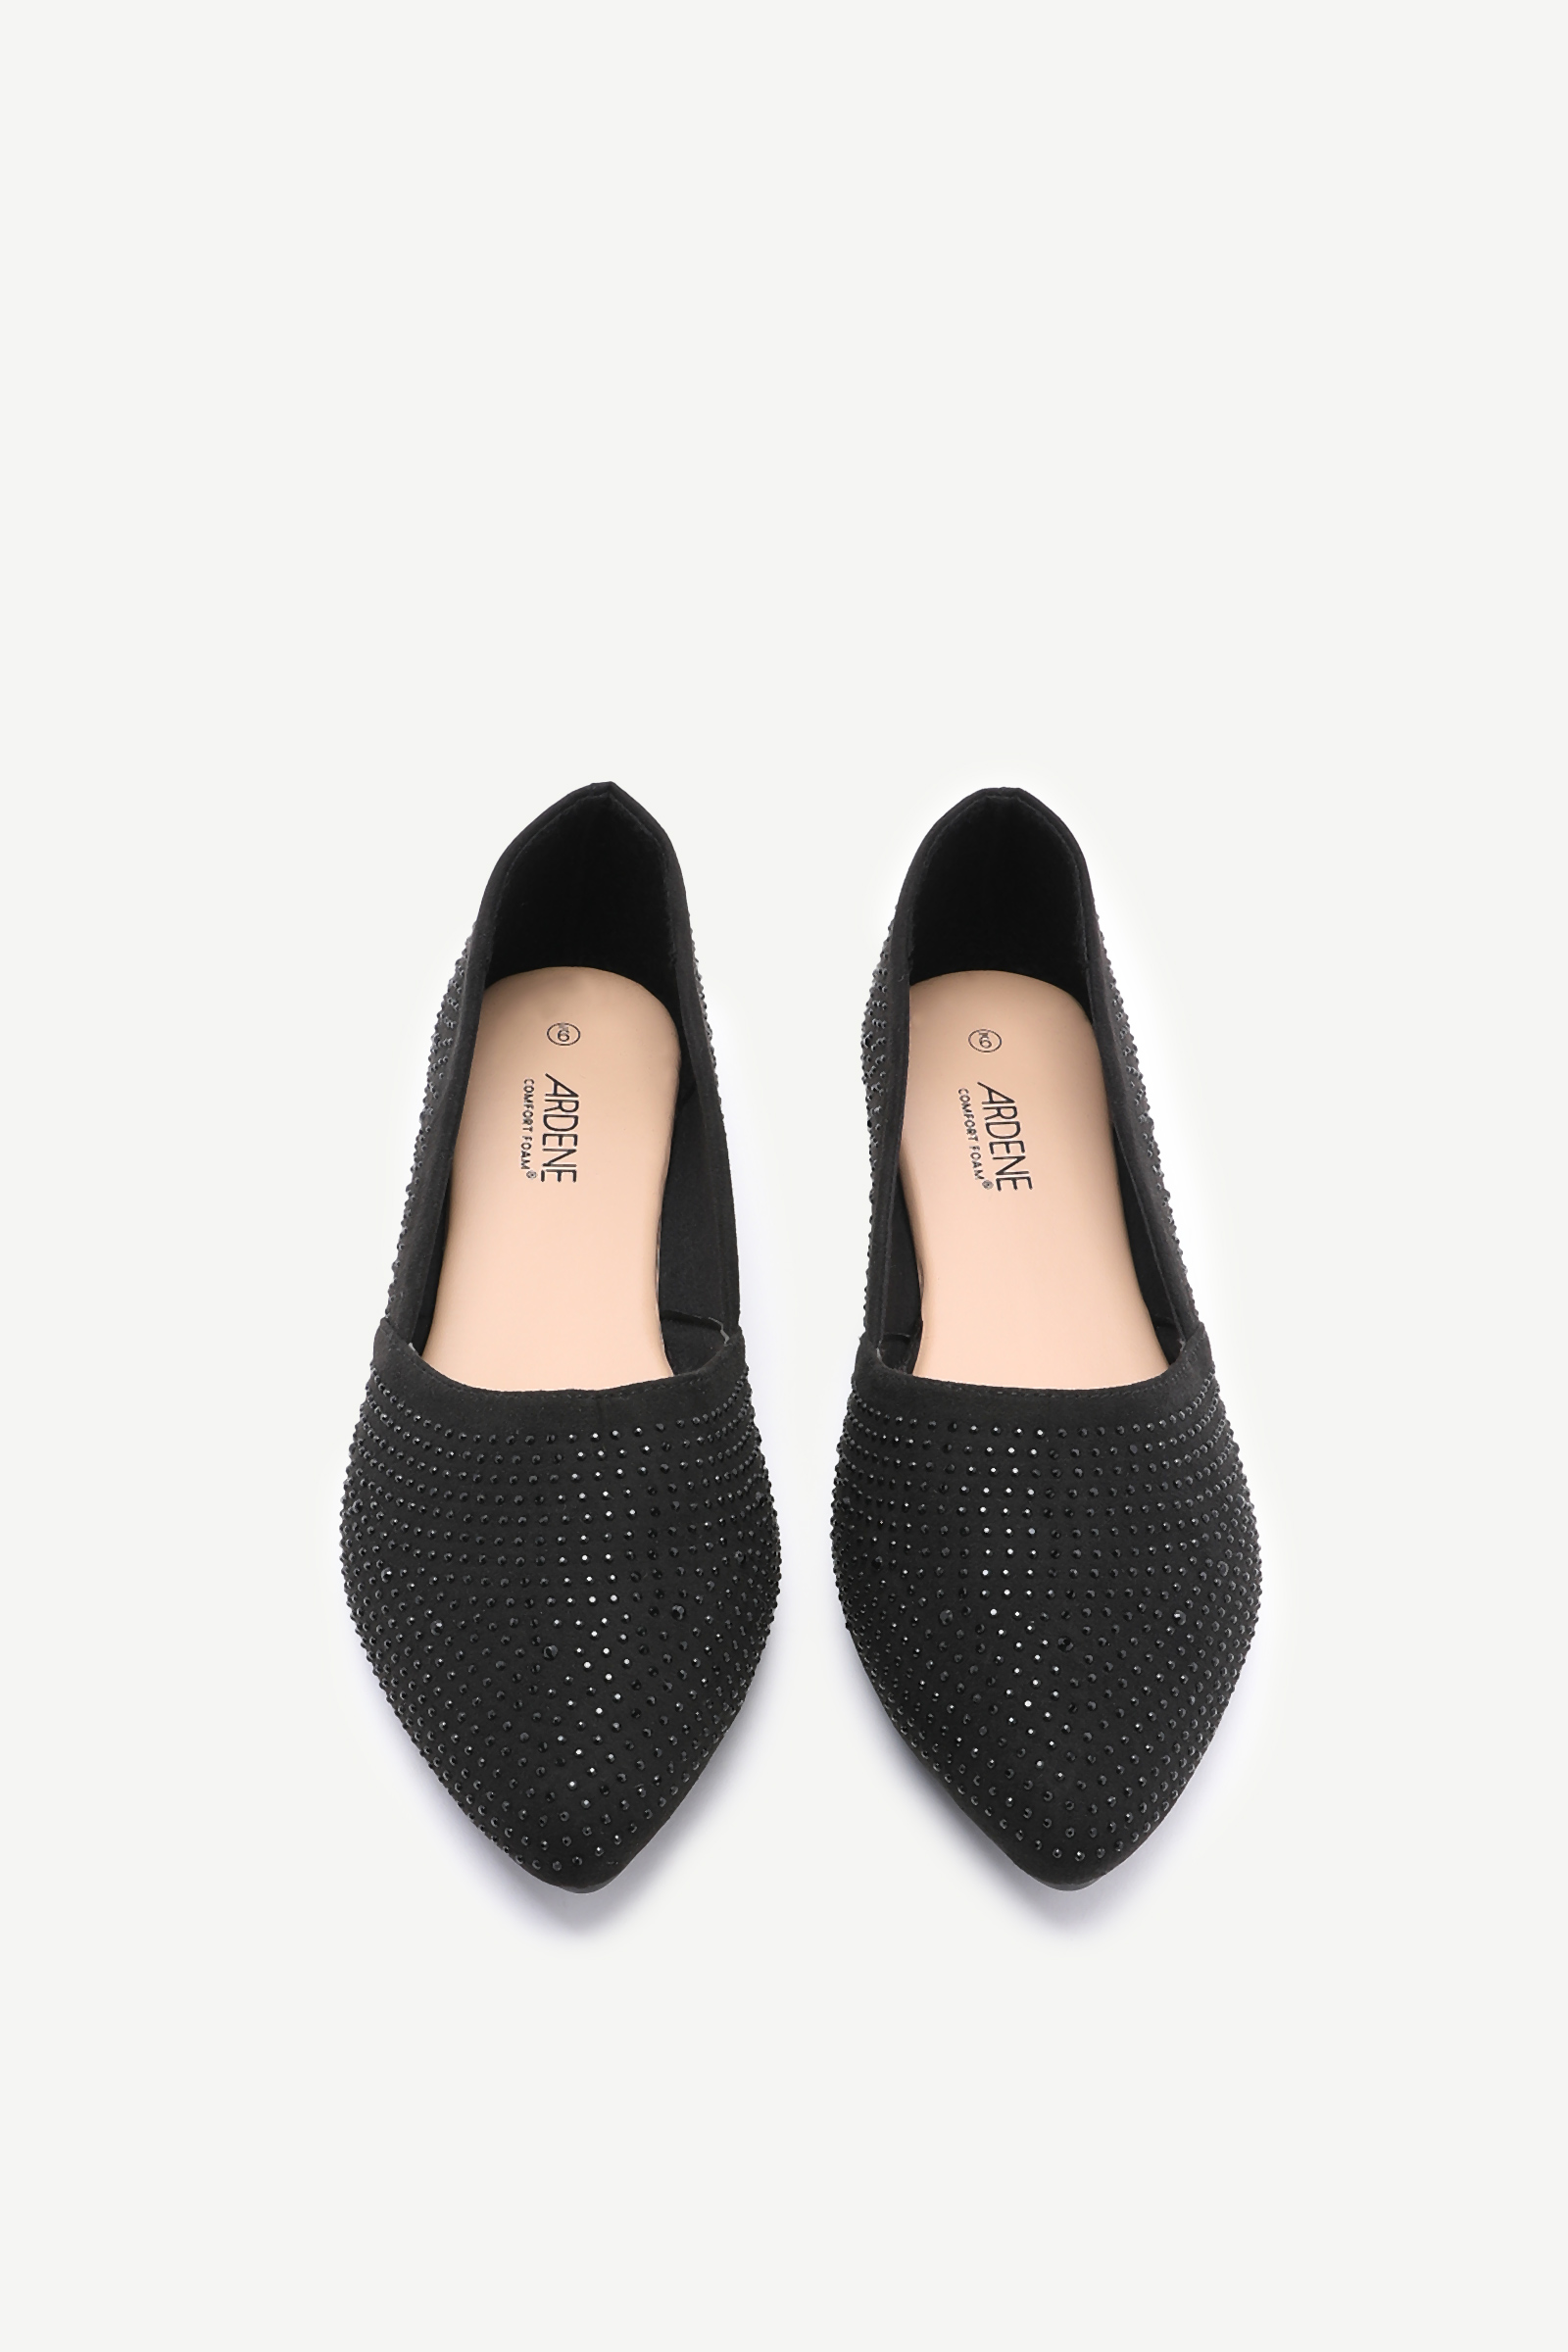 Studded Pointy Toe Flats